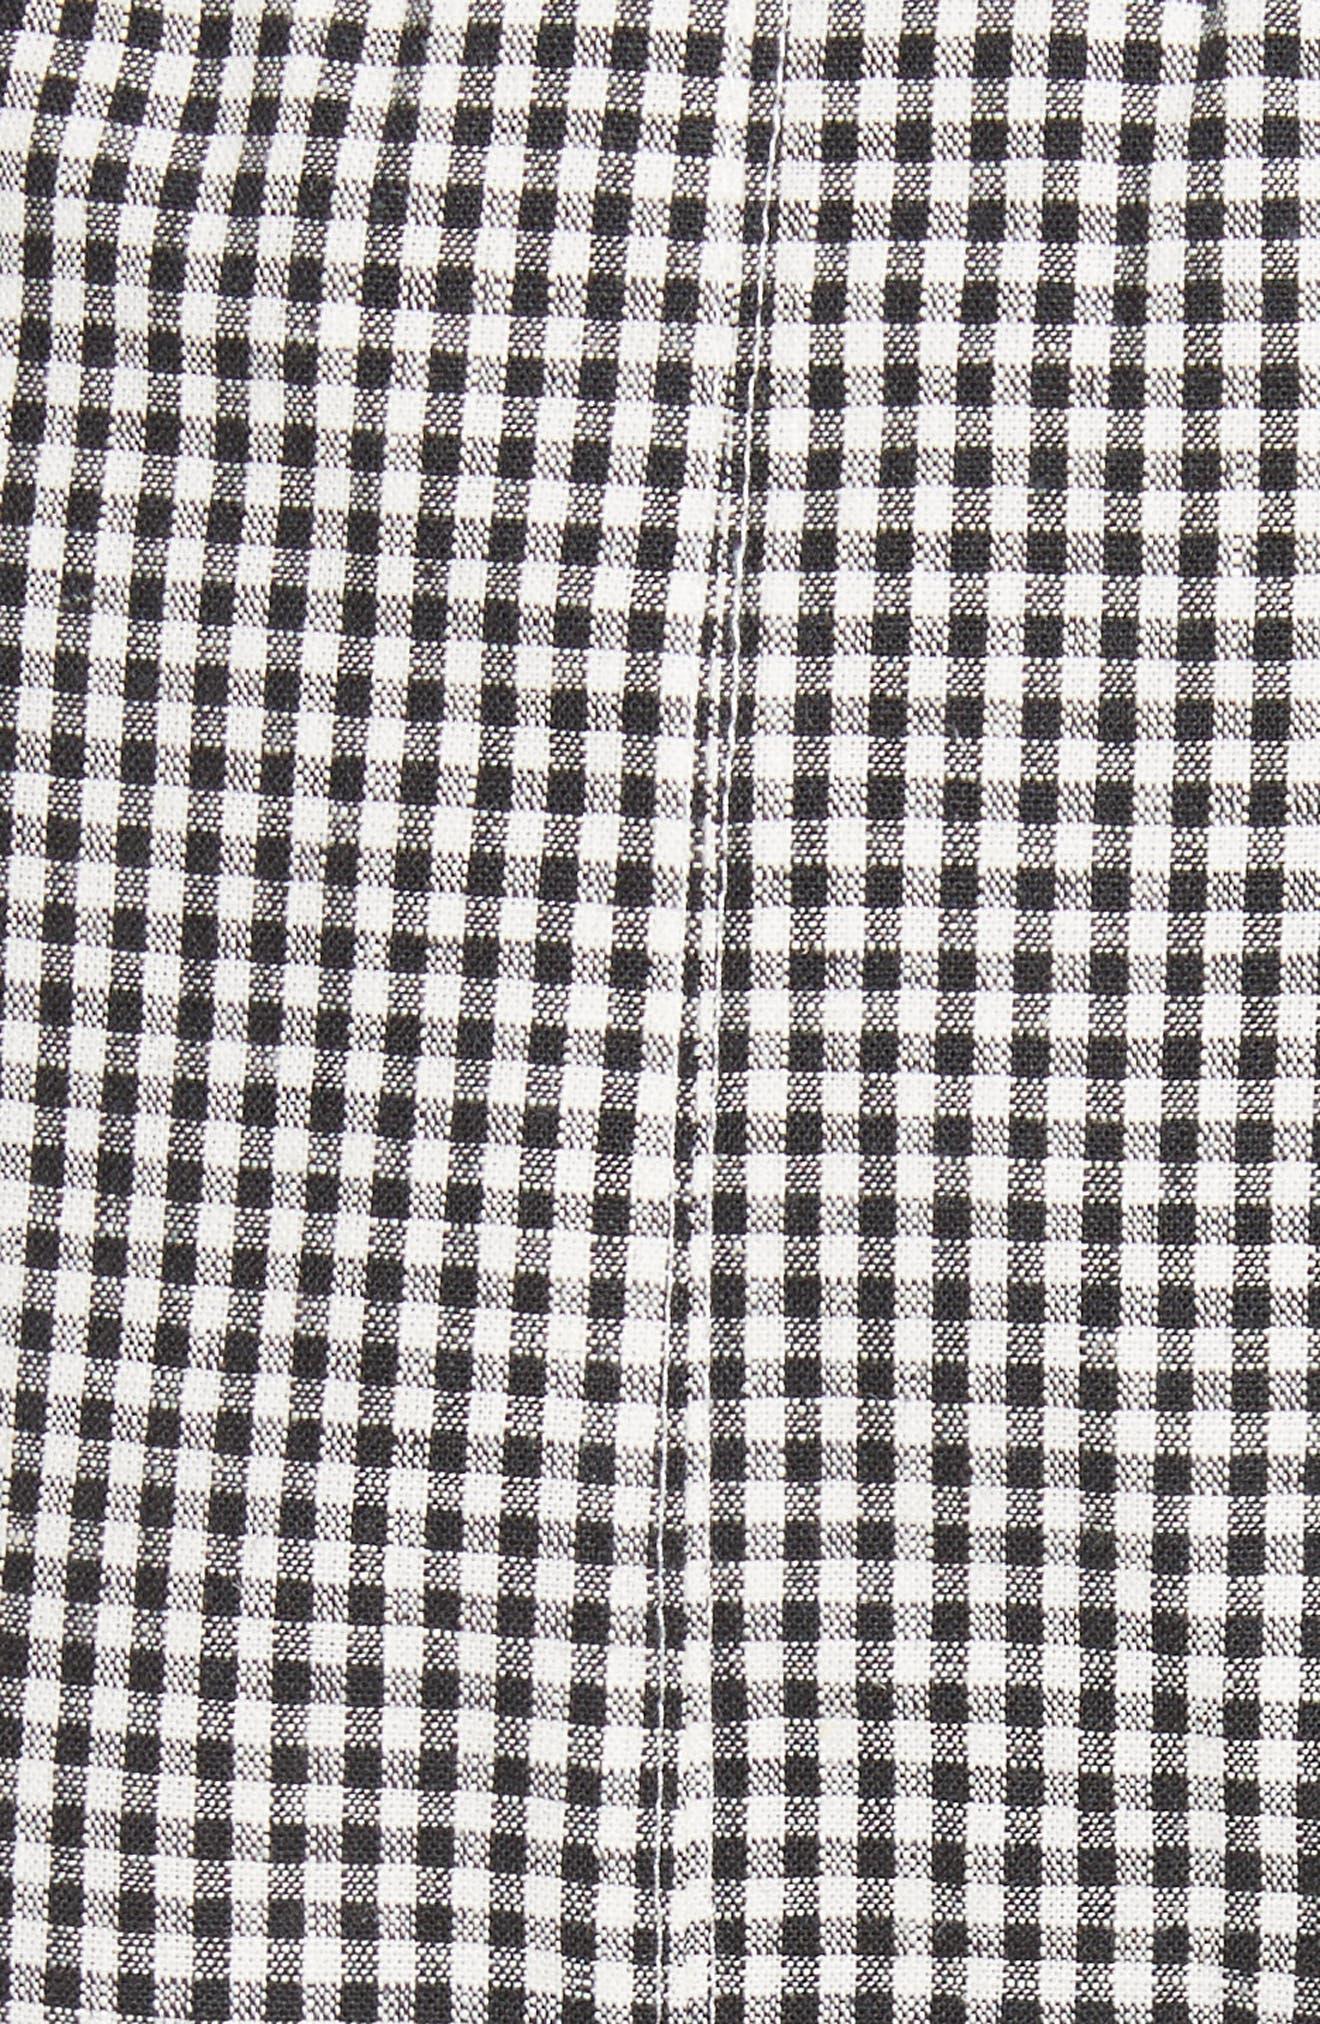 Alternate Image 5  - Sandy Liang Uniform Gingham Linen & Cotton Skirt